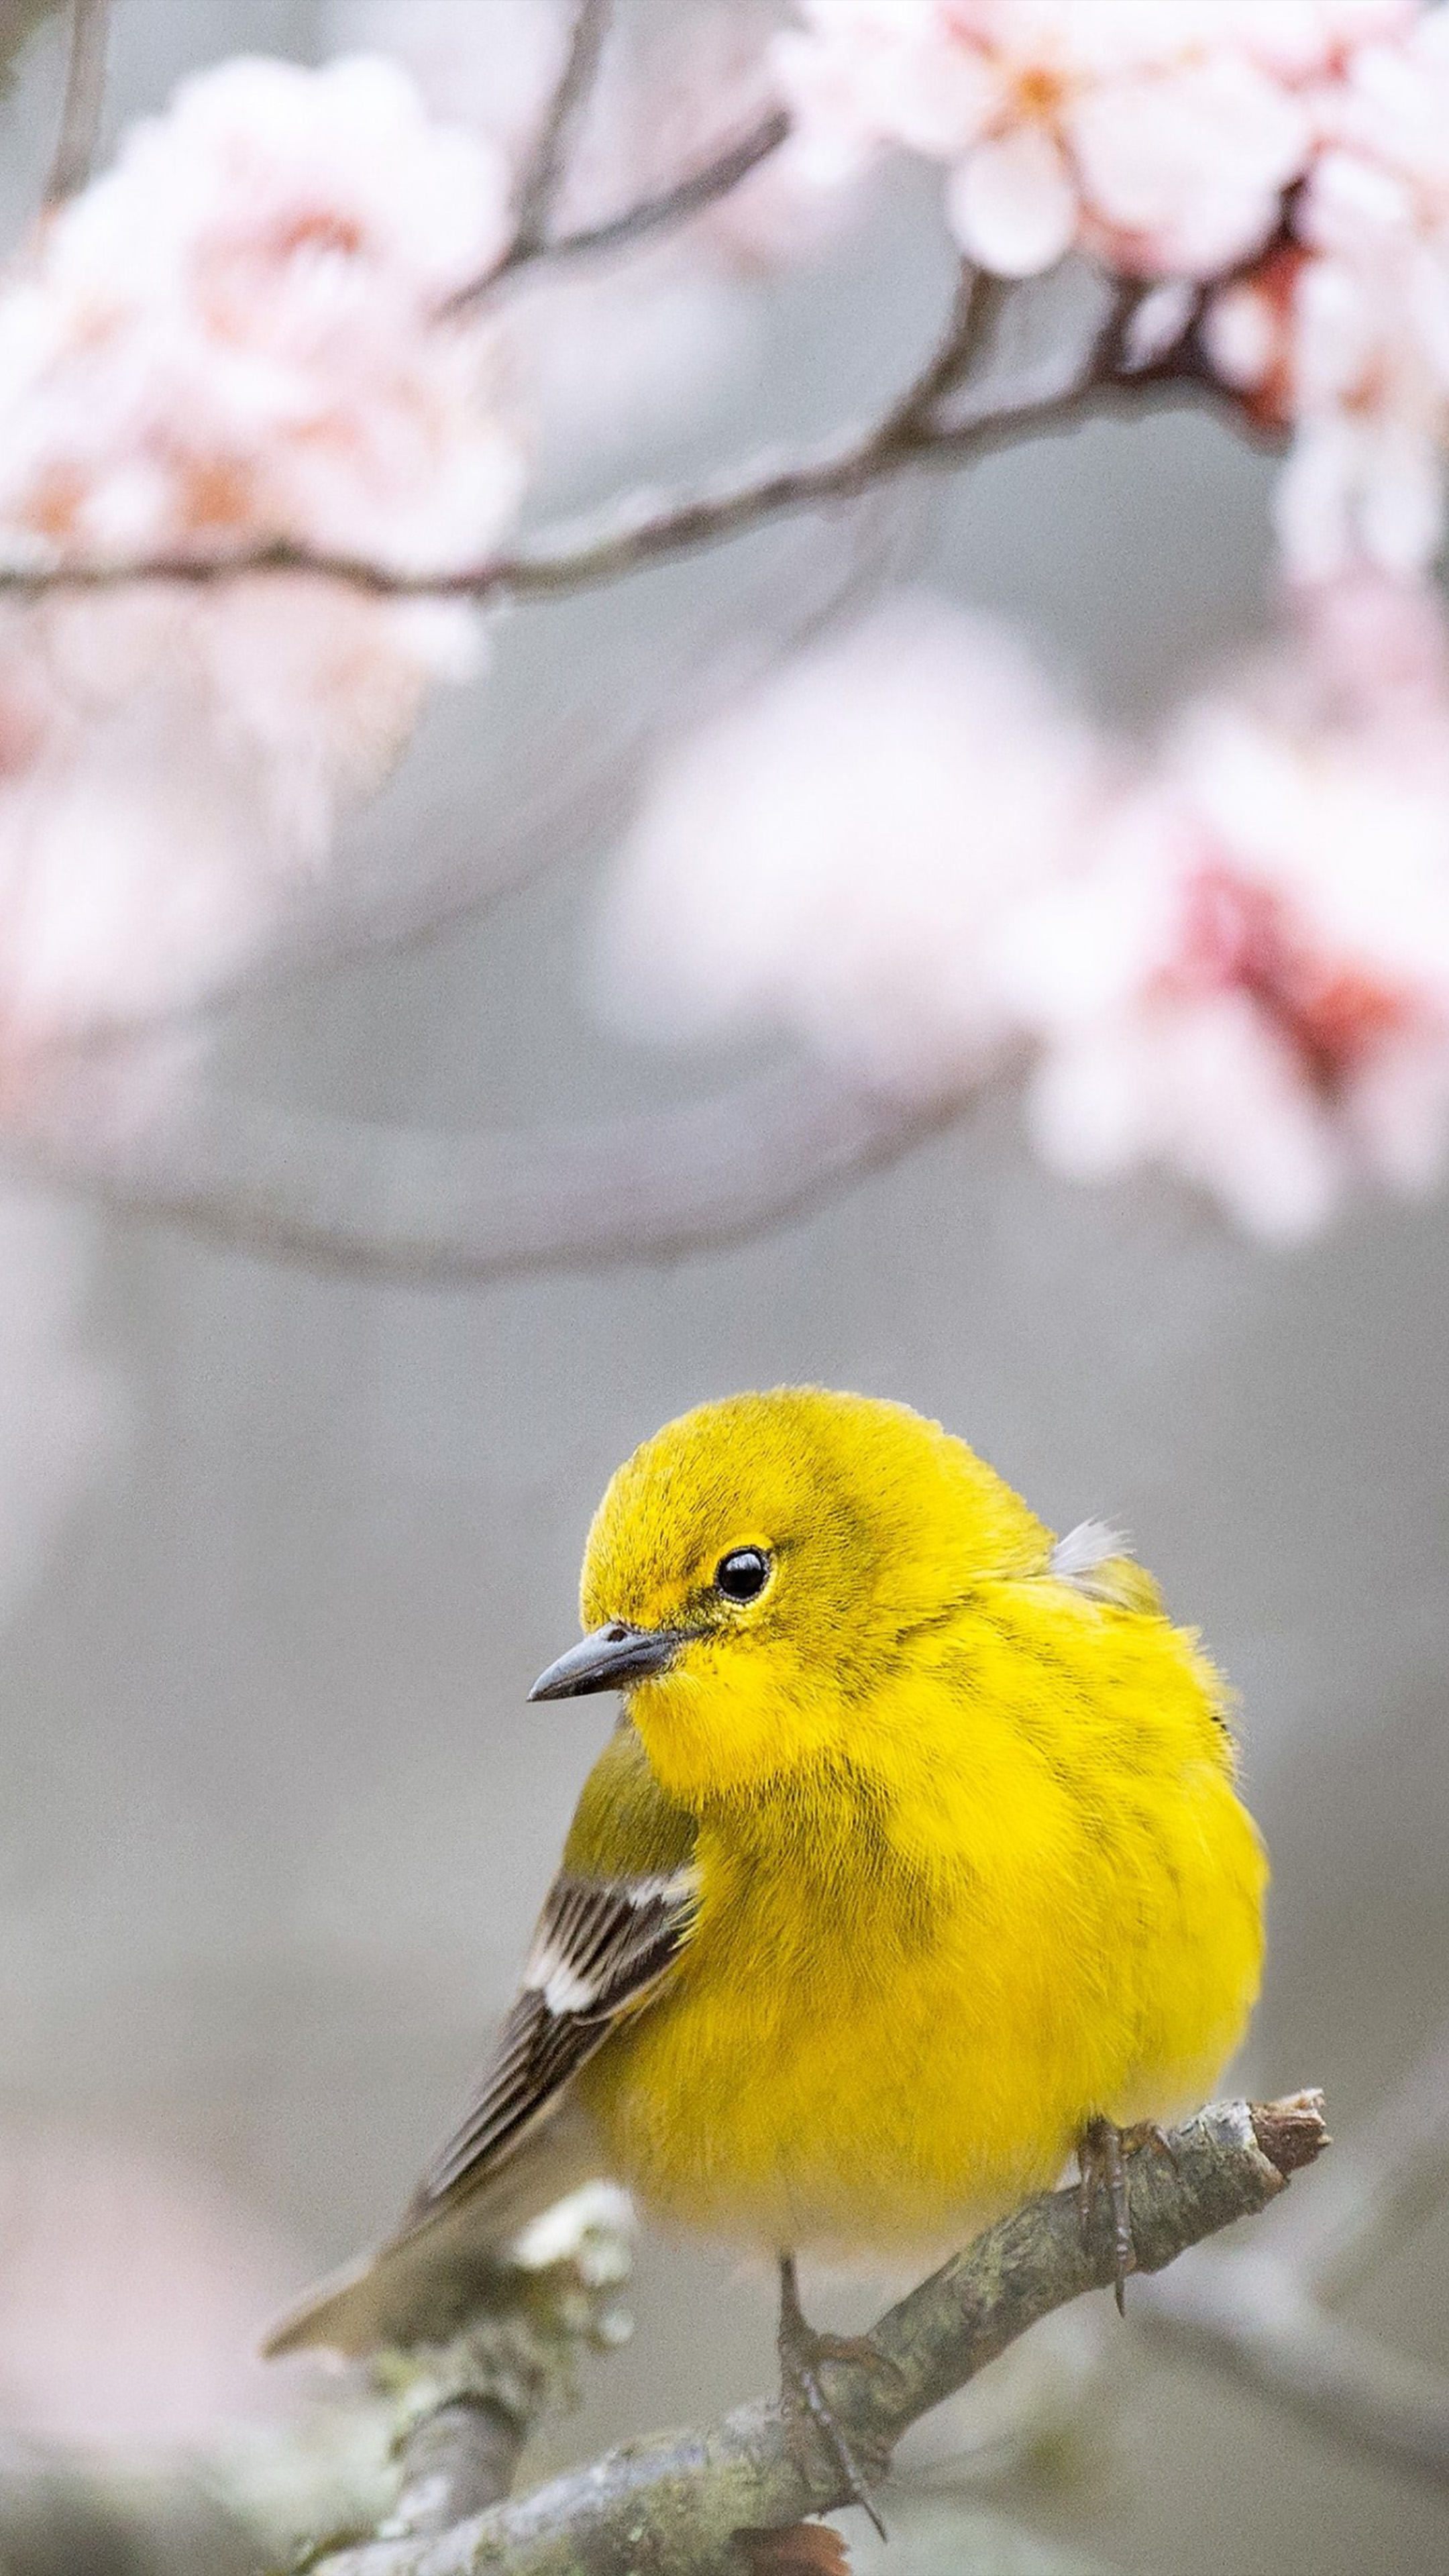 Pine Warbler Yellow Bird 4k Ultra Hd Mobile Wallpaper